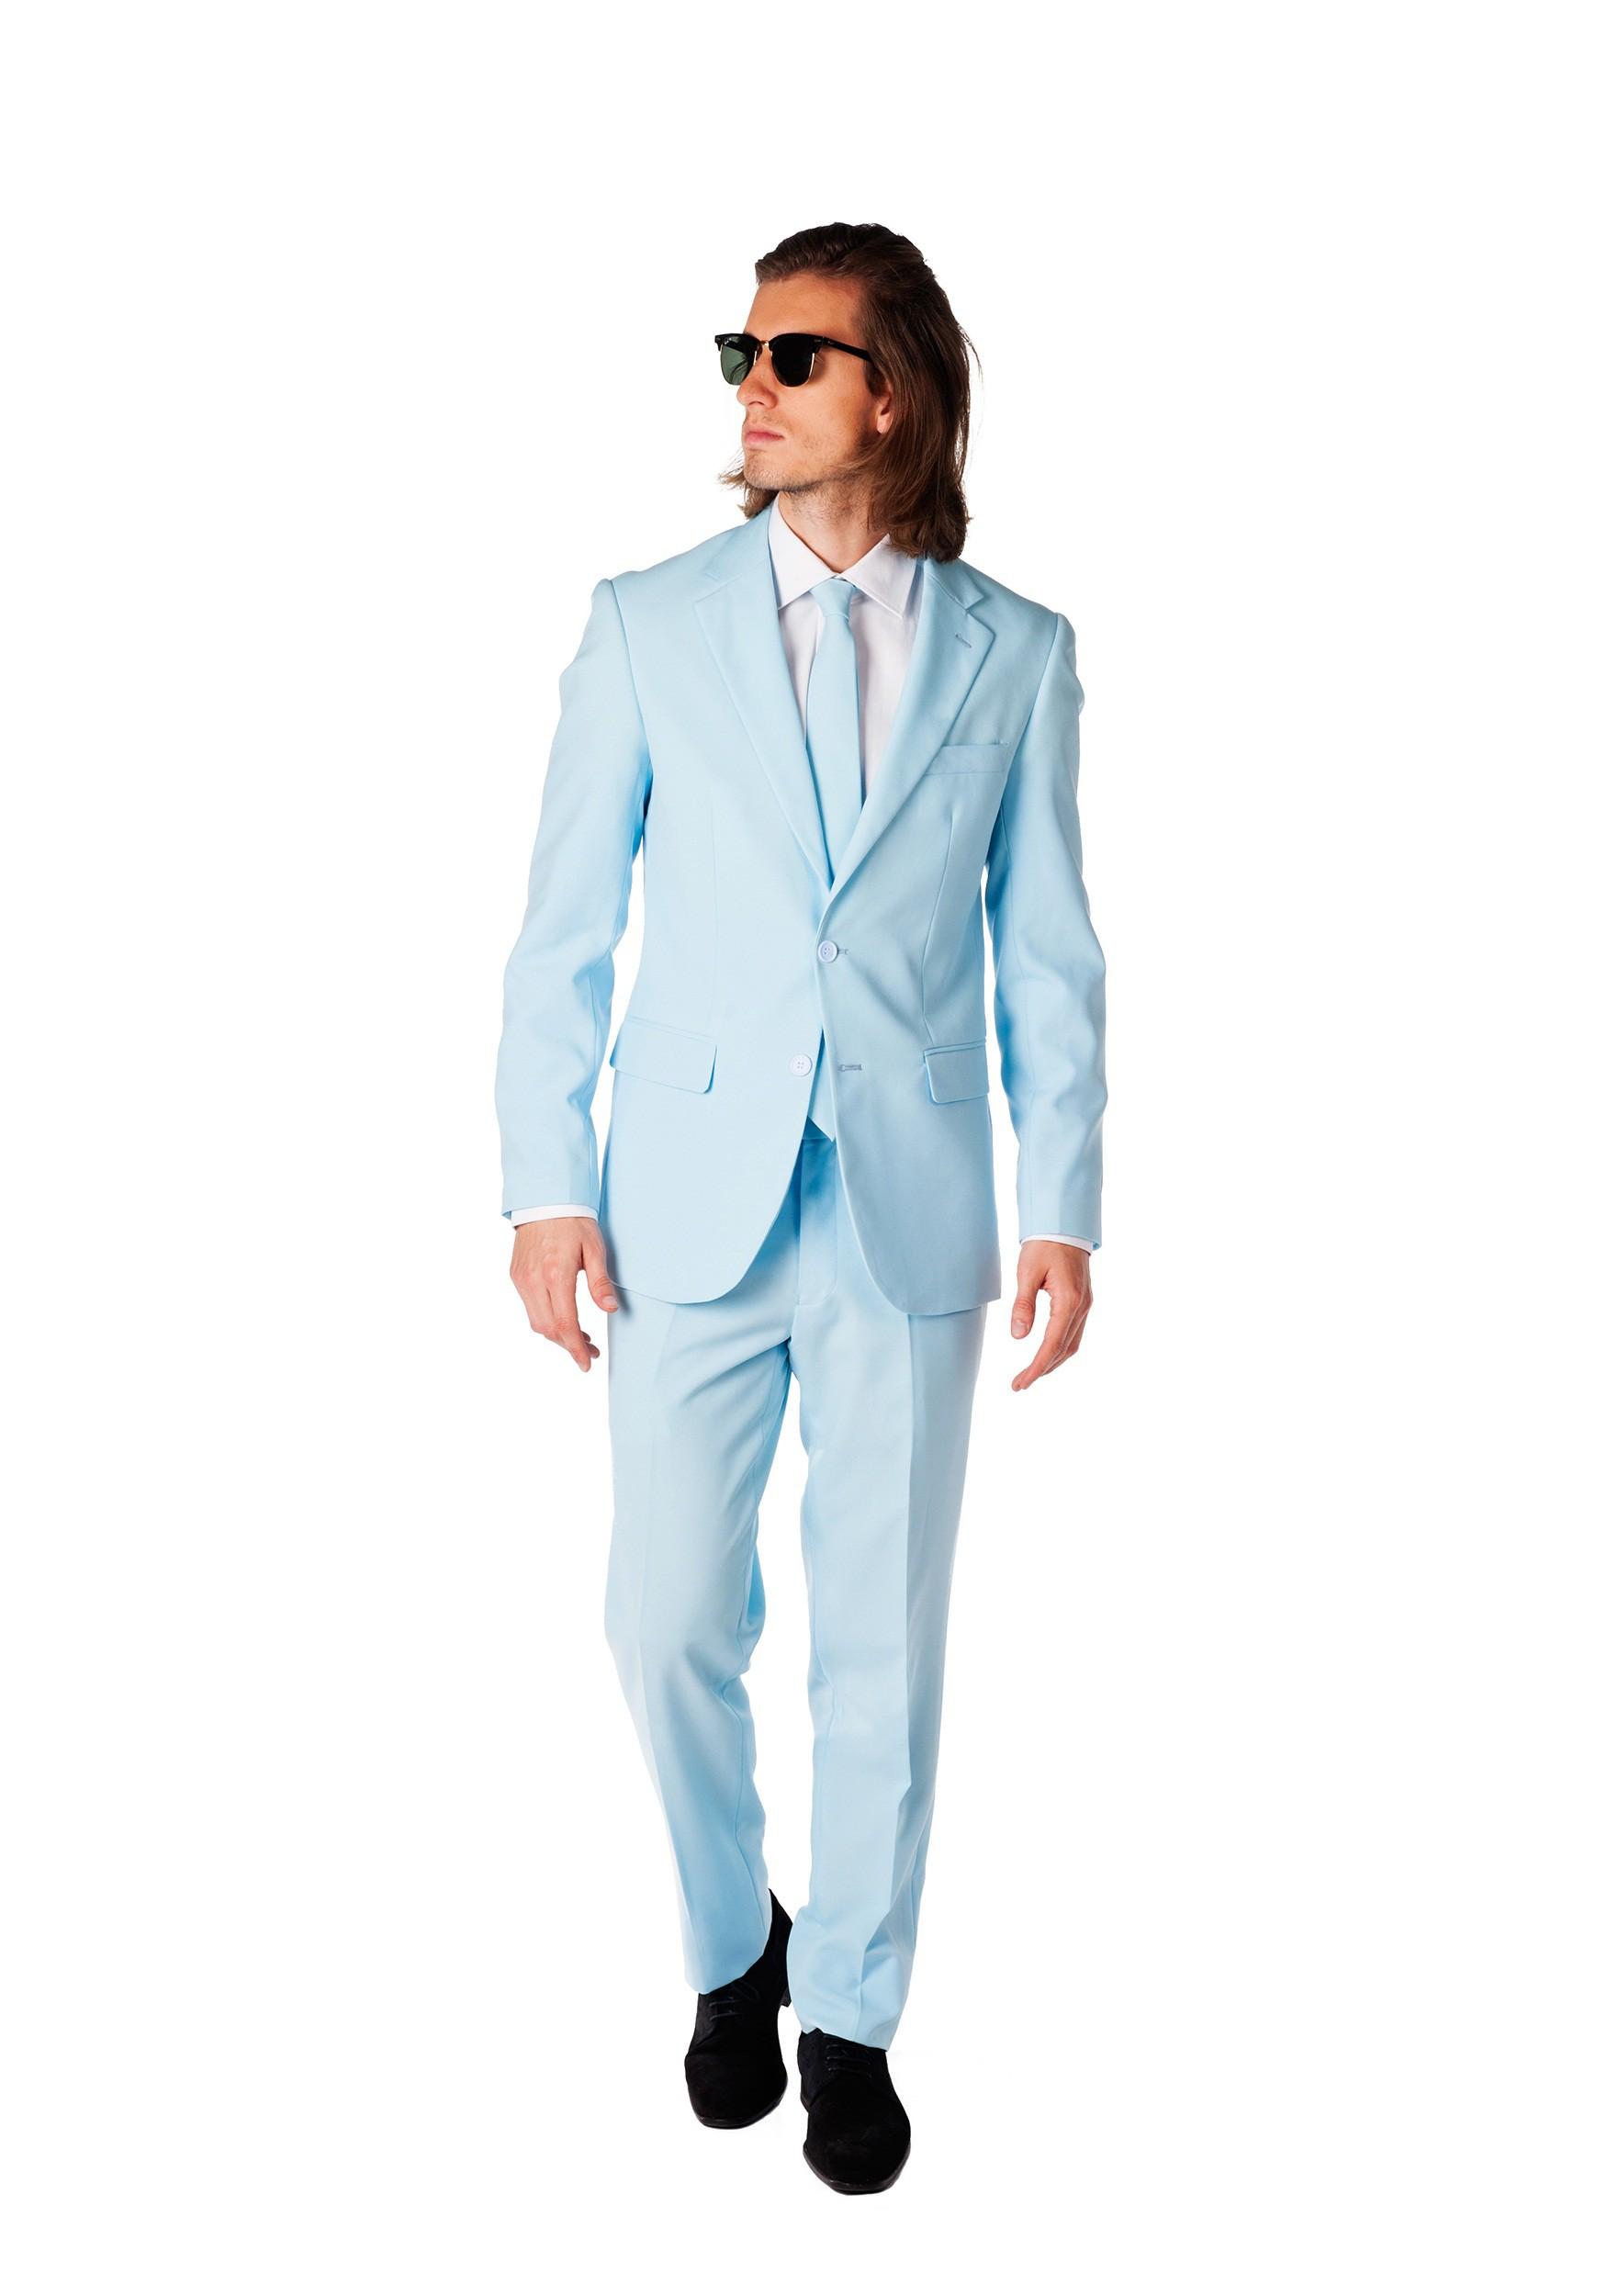 Men's OppoSuits Baby Blue Suit